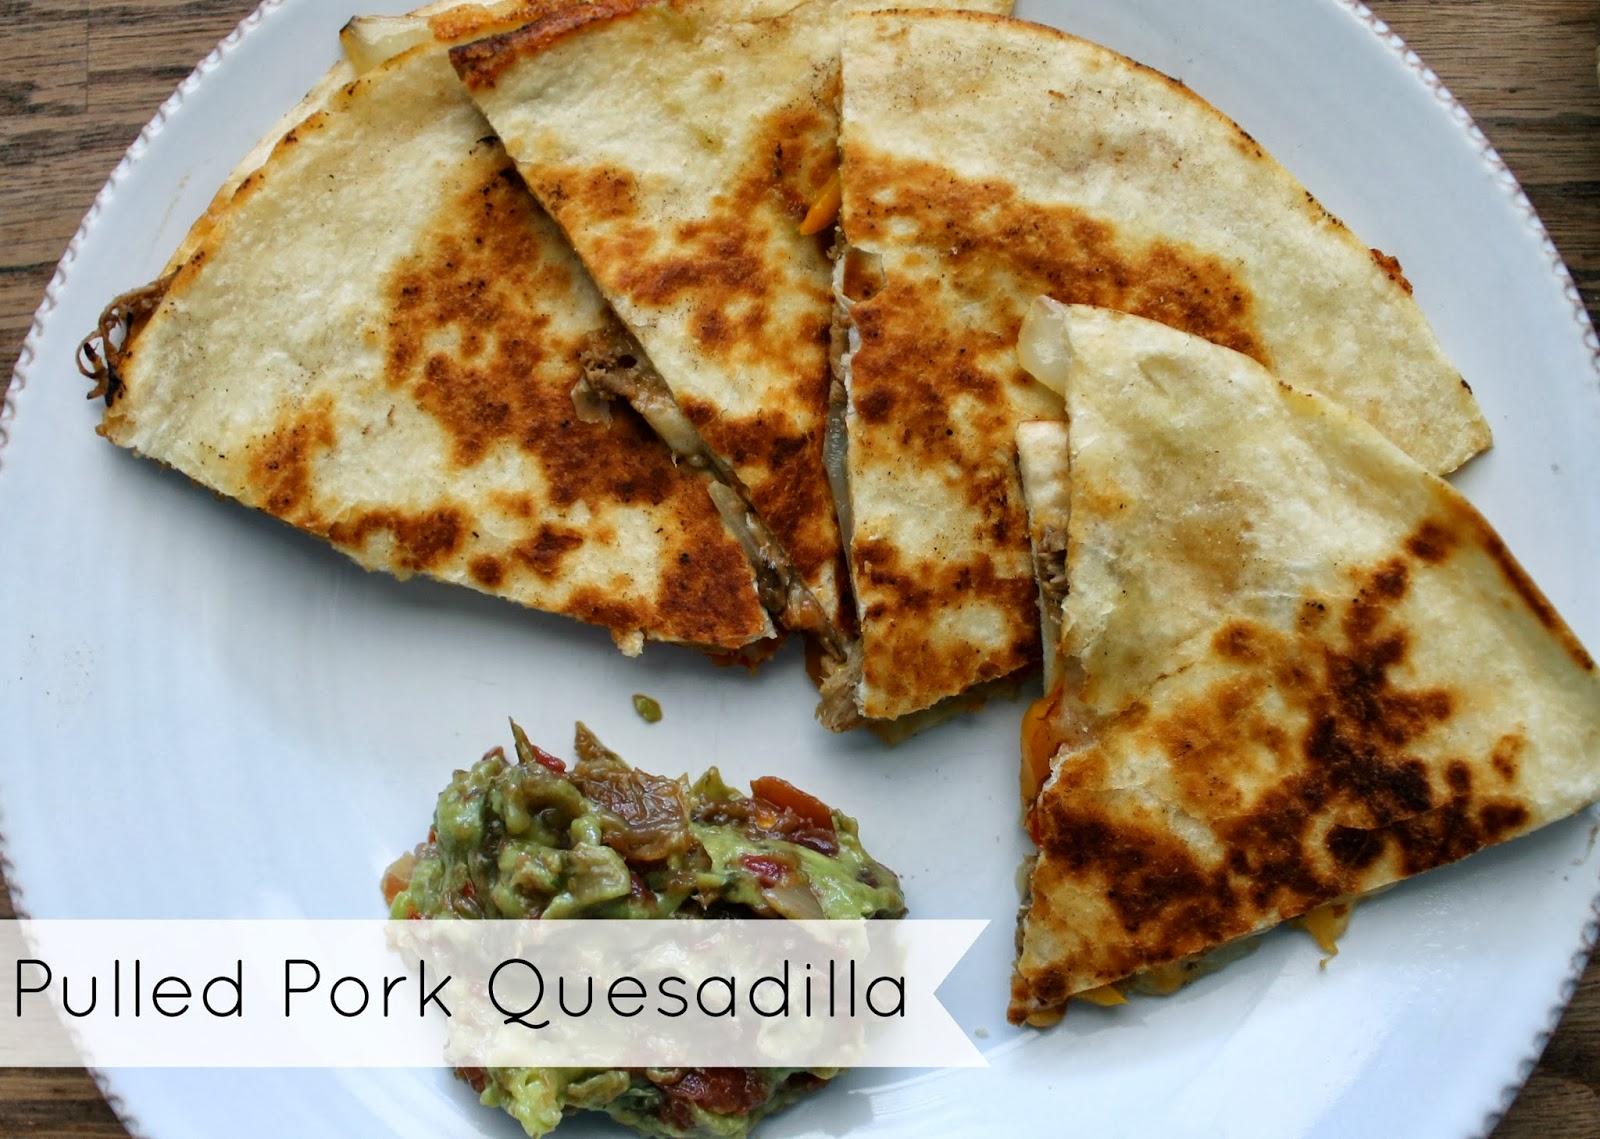 Wonderfully Made: Pulled Pork Quesadilla